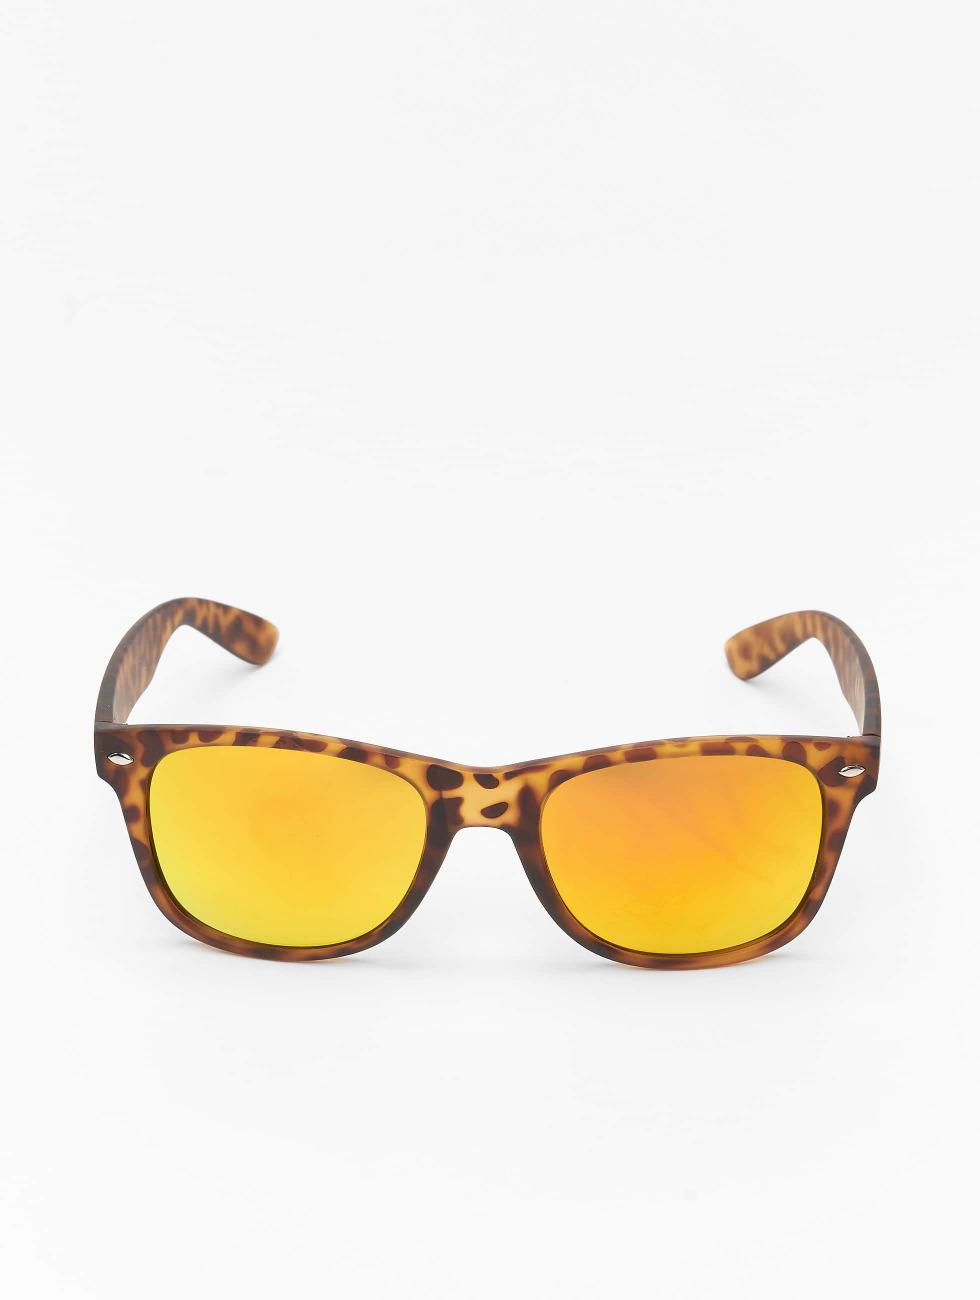 MSTRDS Sonnenbrille Likoma Mirror braun